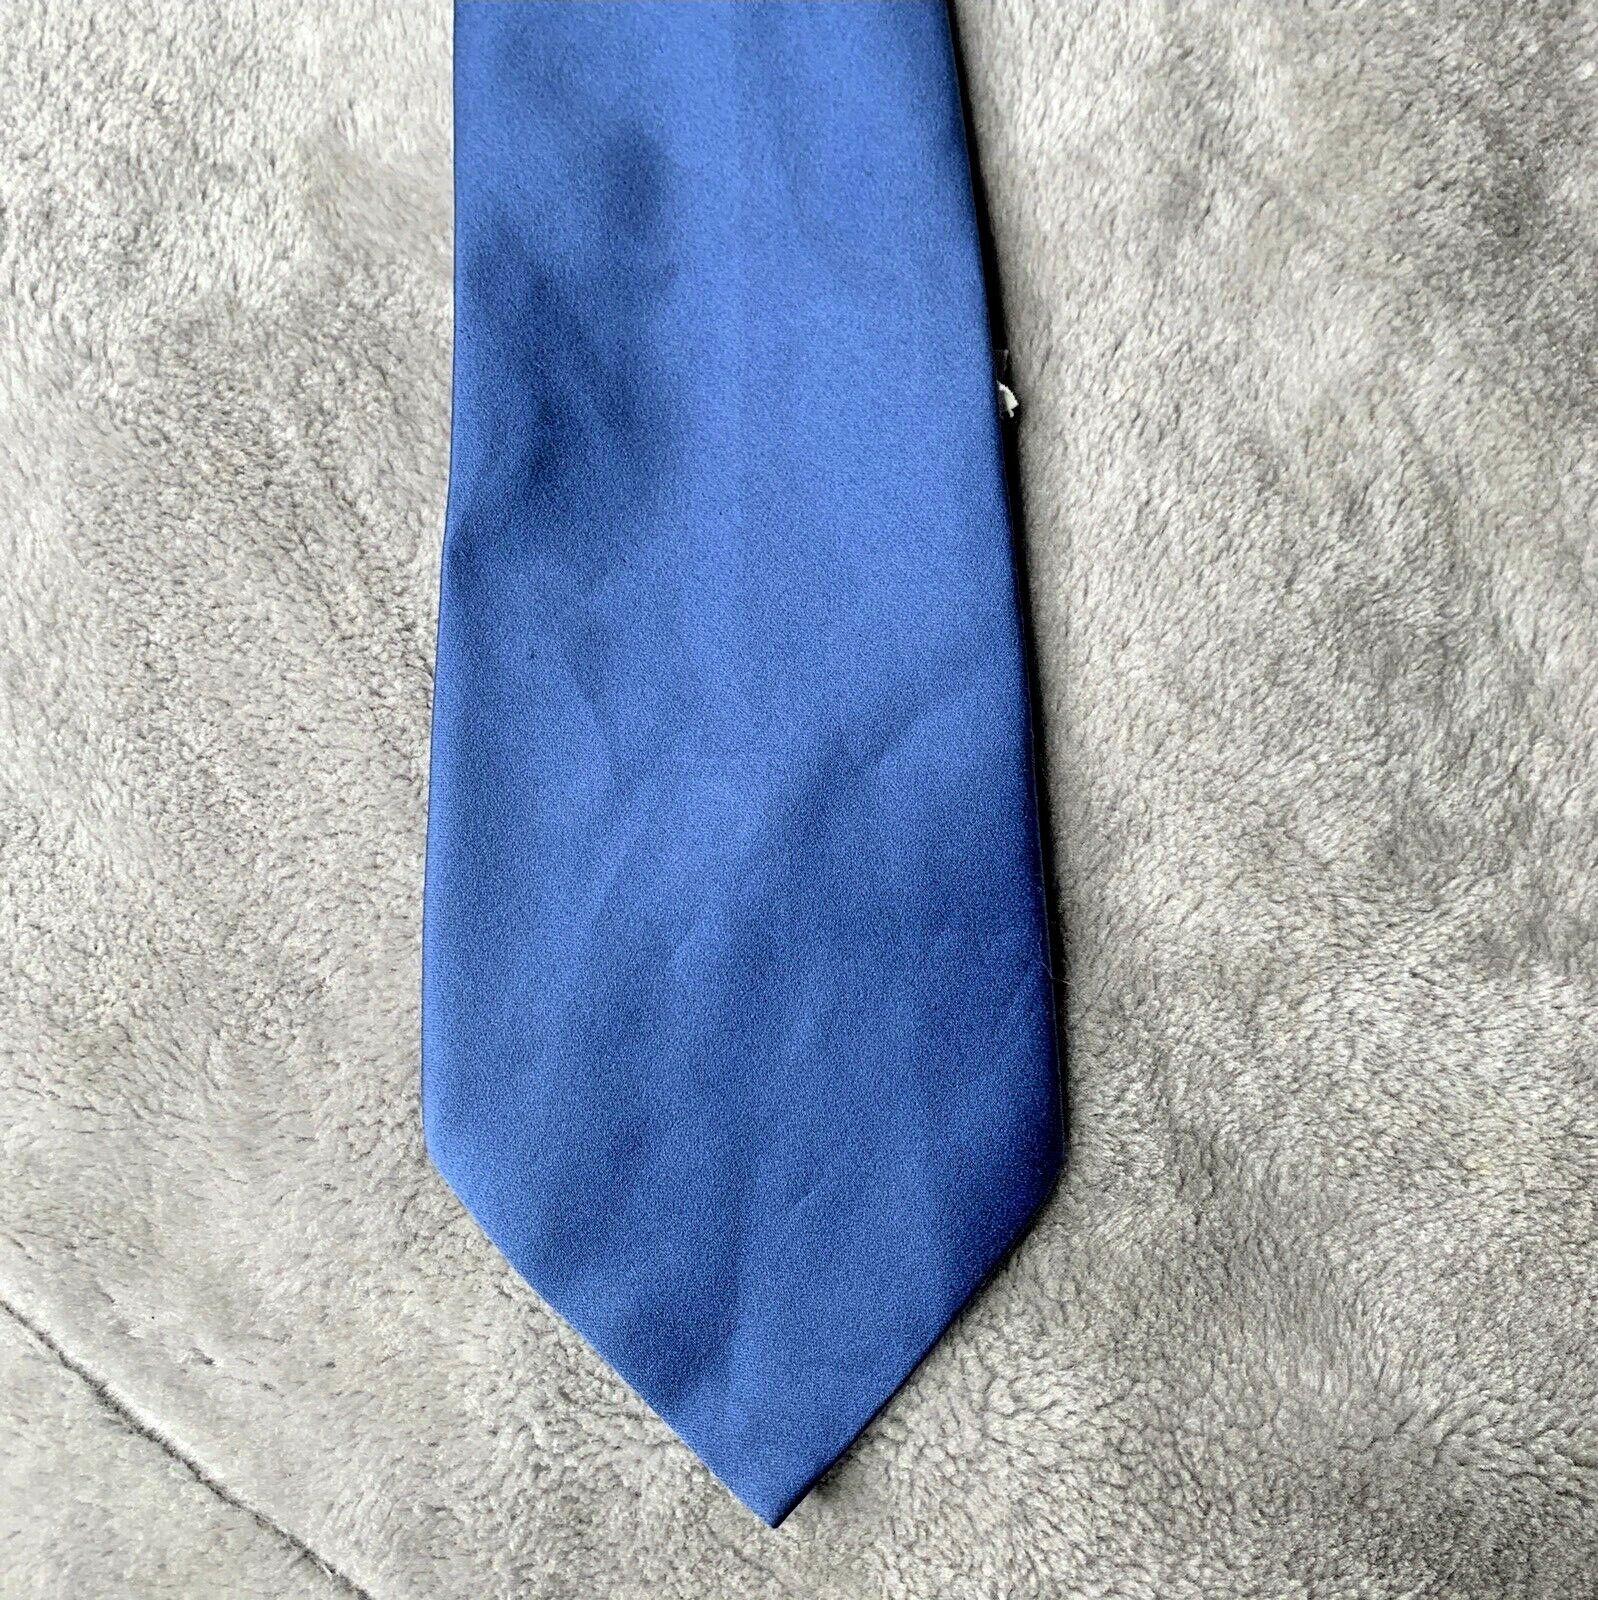 Keynote Vintage Mens Tie Blue Shiny New Tied Wide Office wear shirt